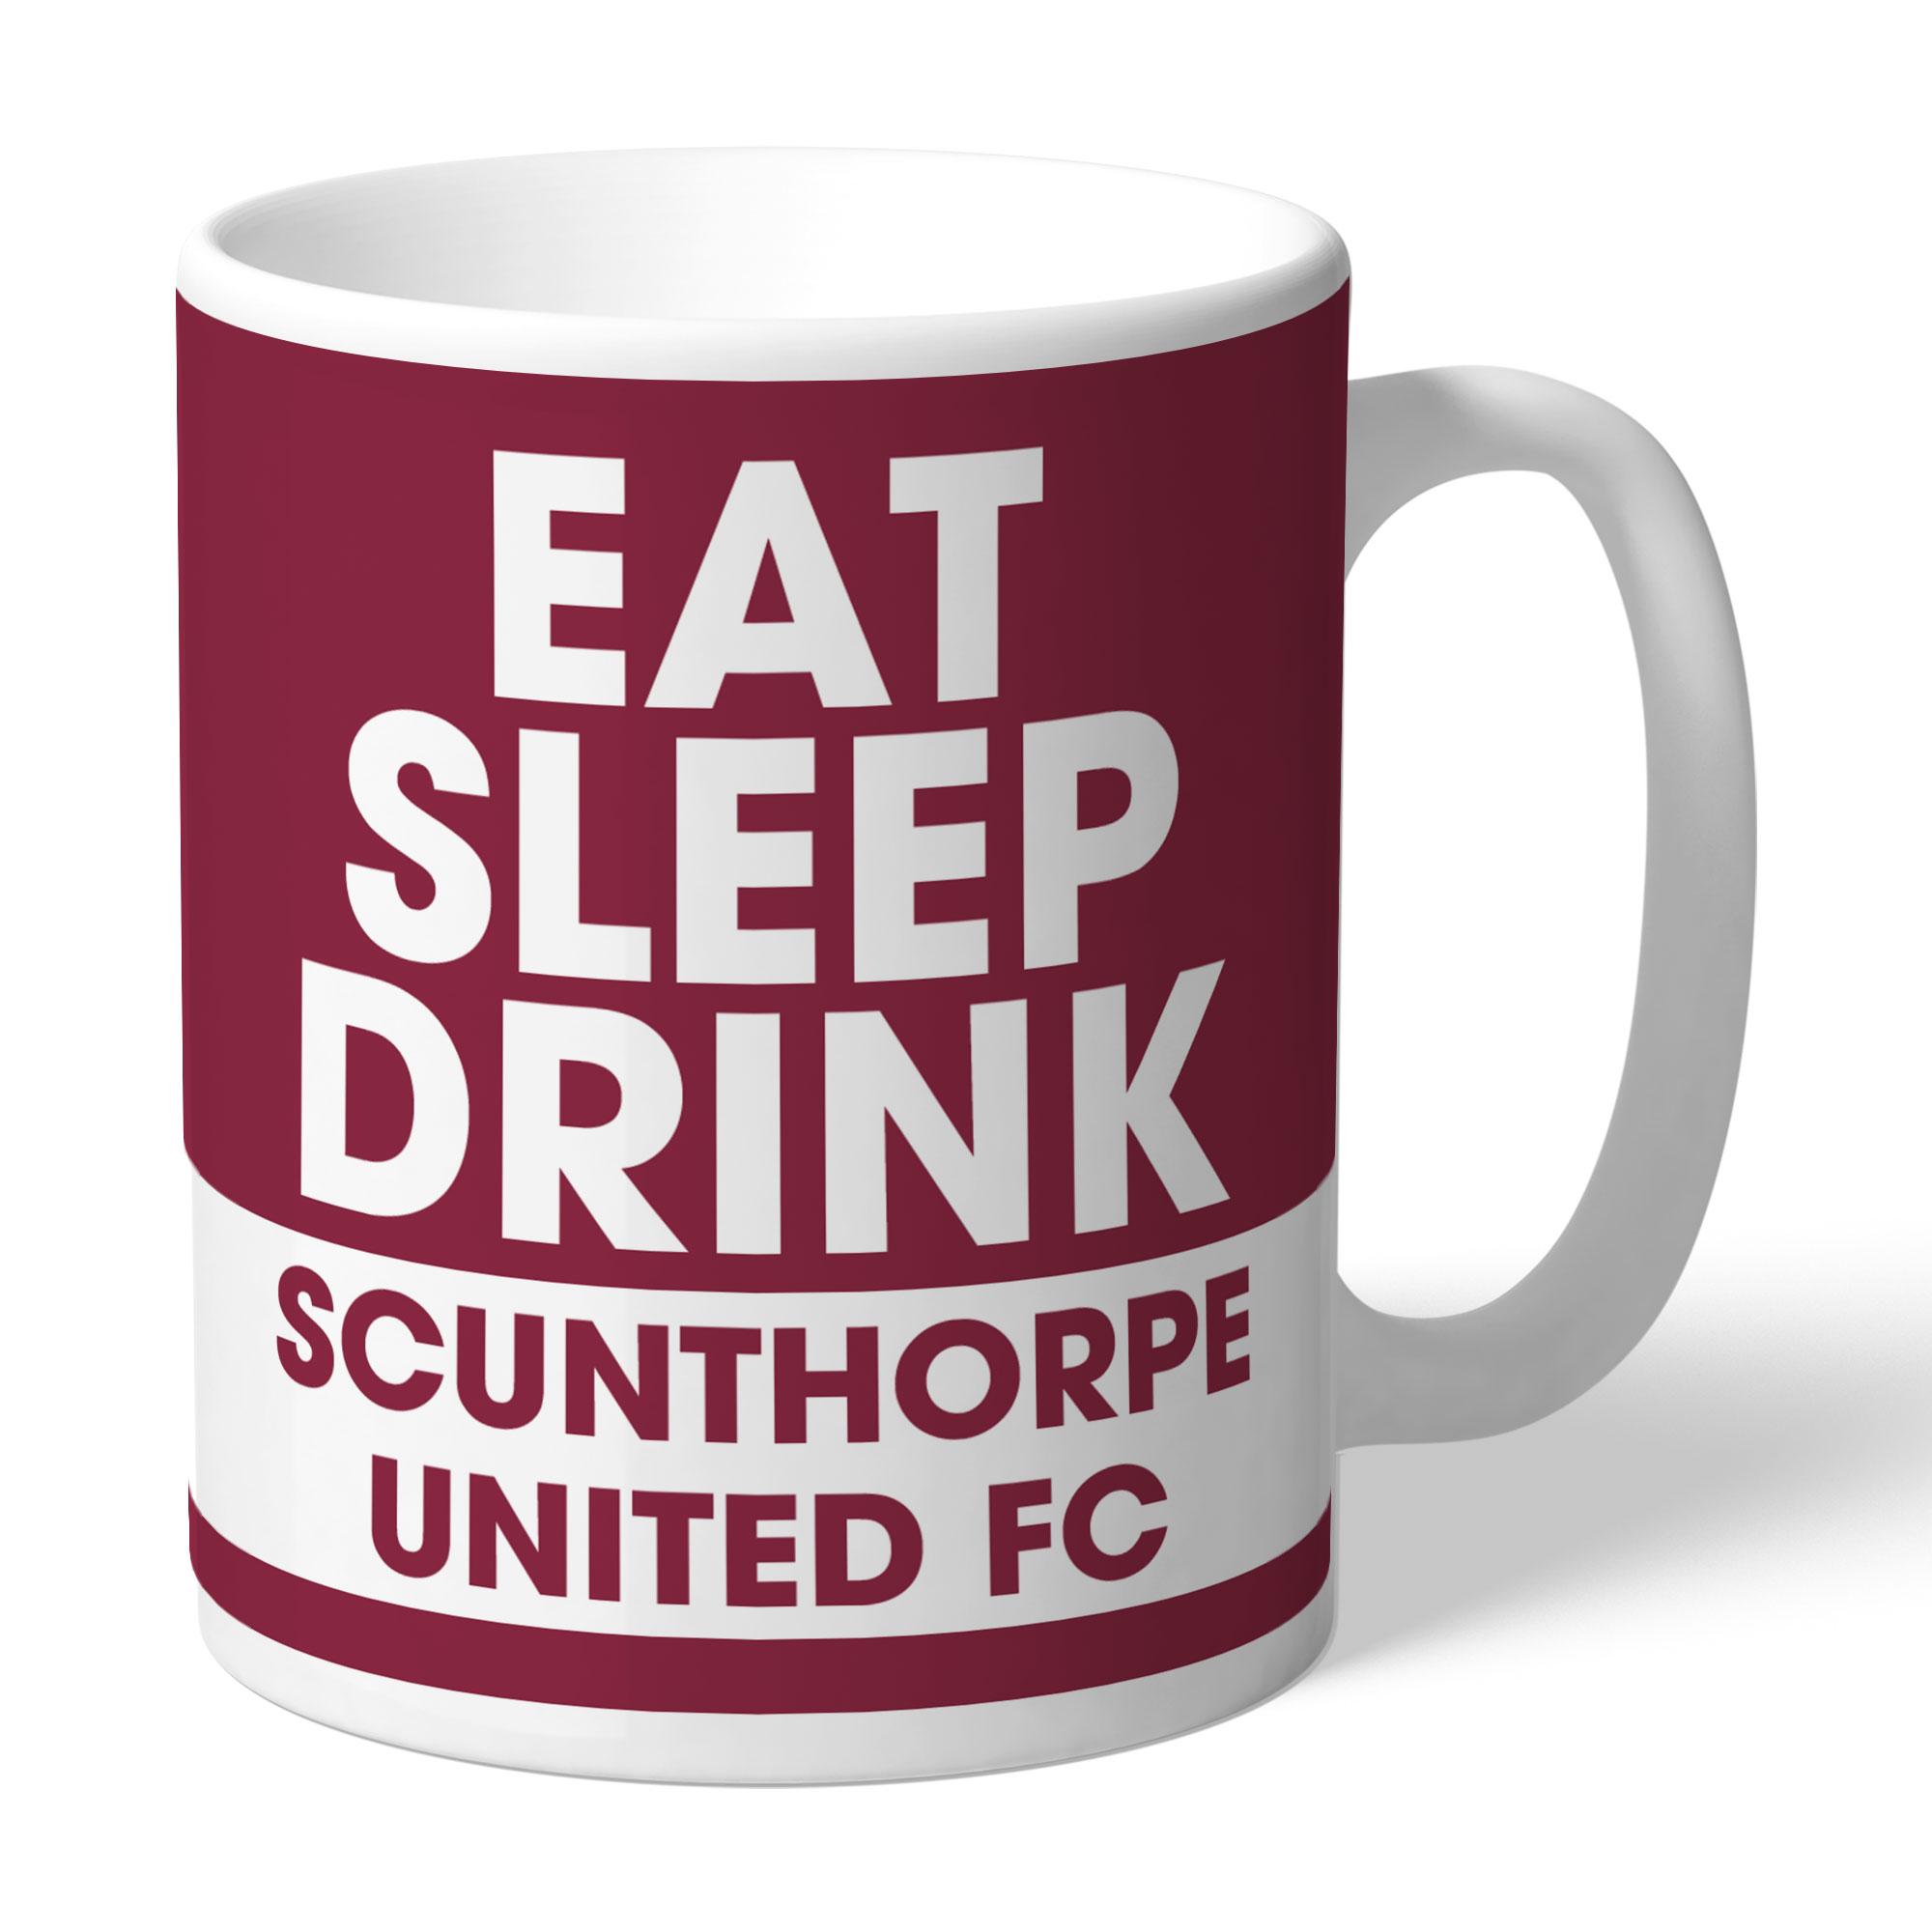 Scunthorpe United FC Eat Sleep Drink Mug